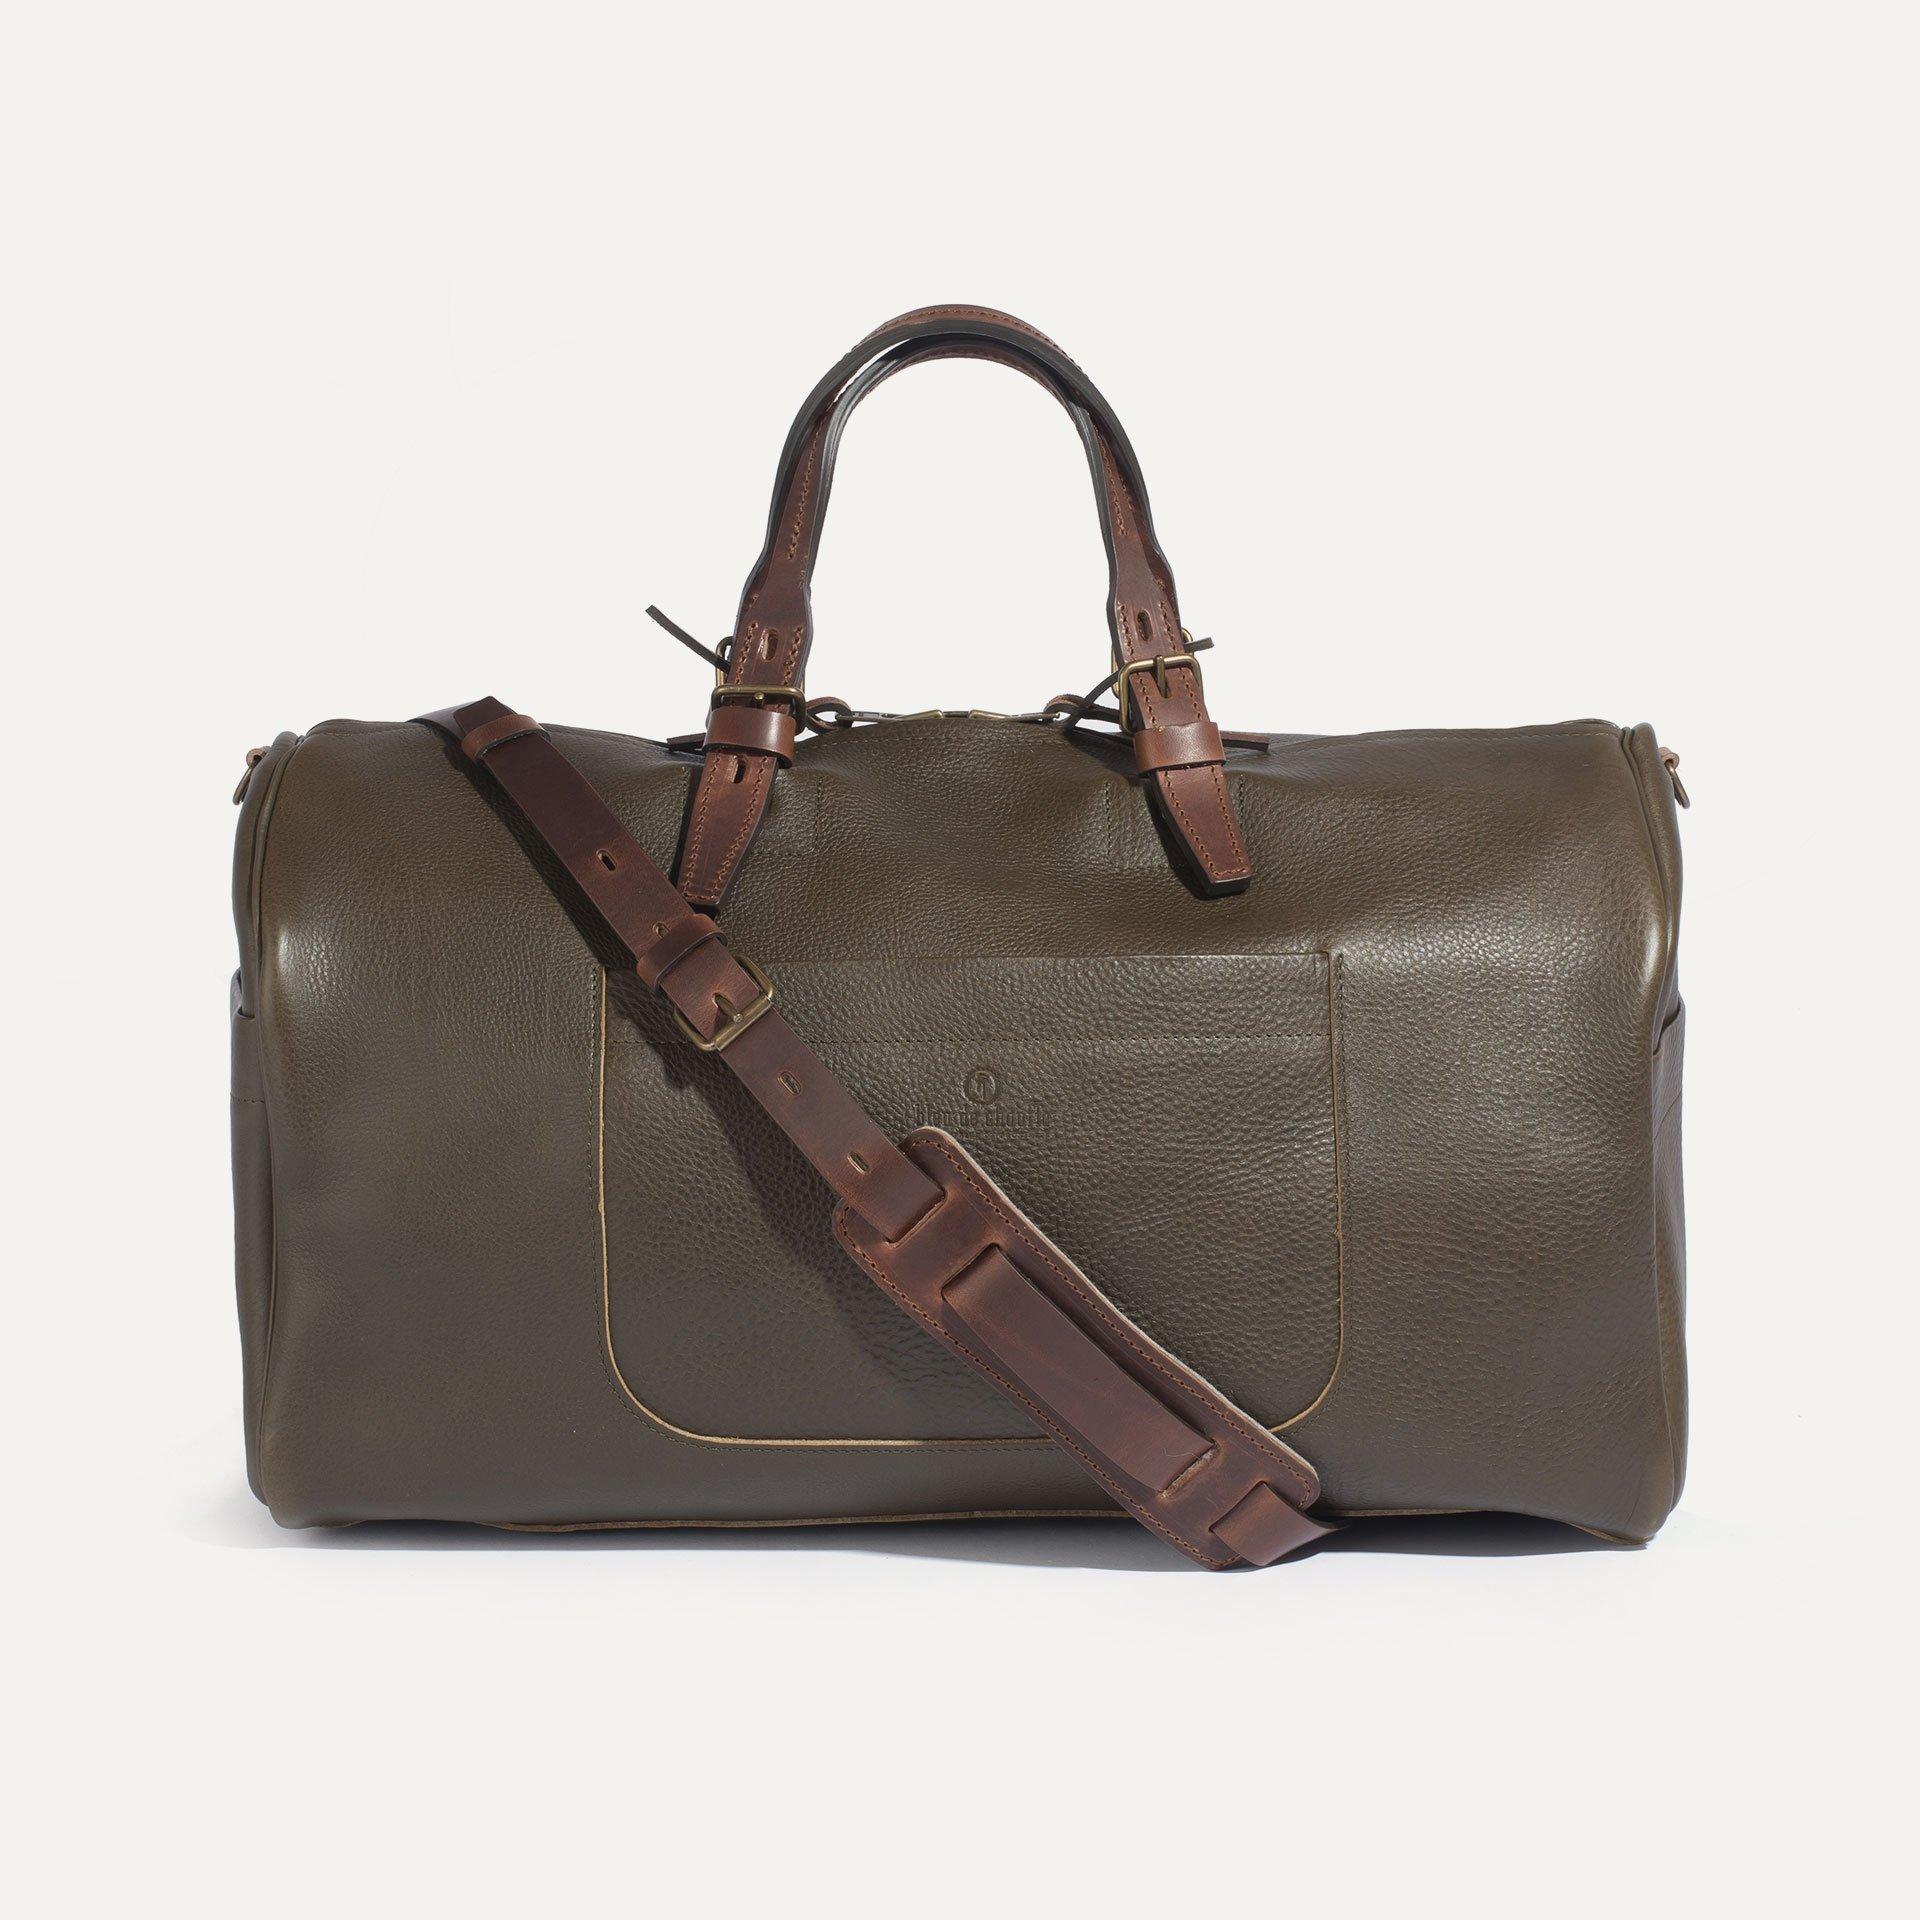 Hobo Travel bag - Khaki (image n°1)